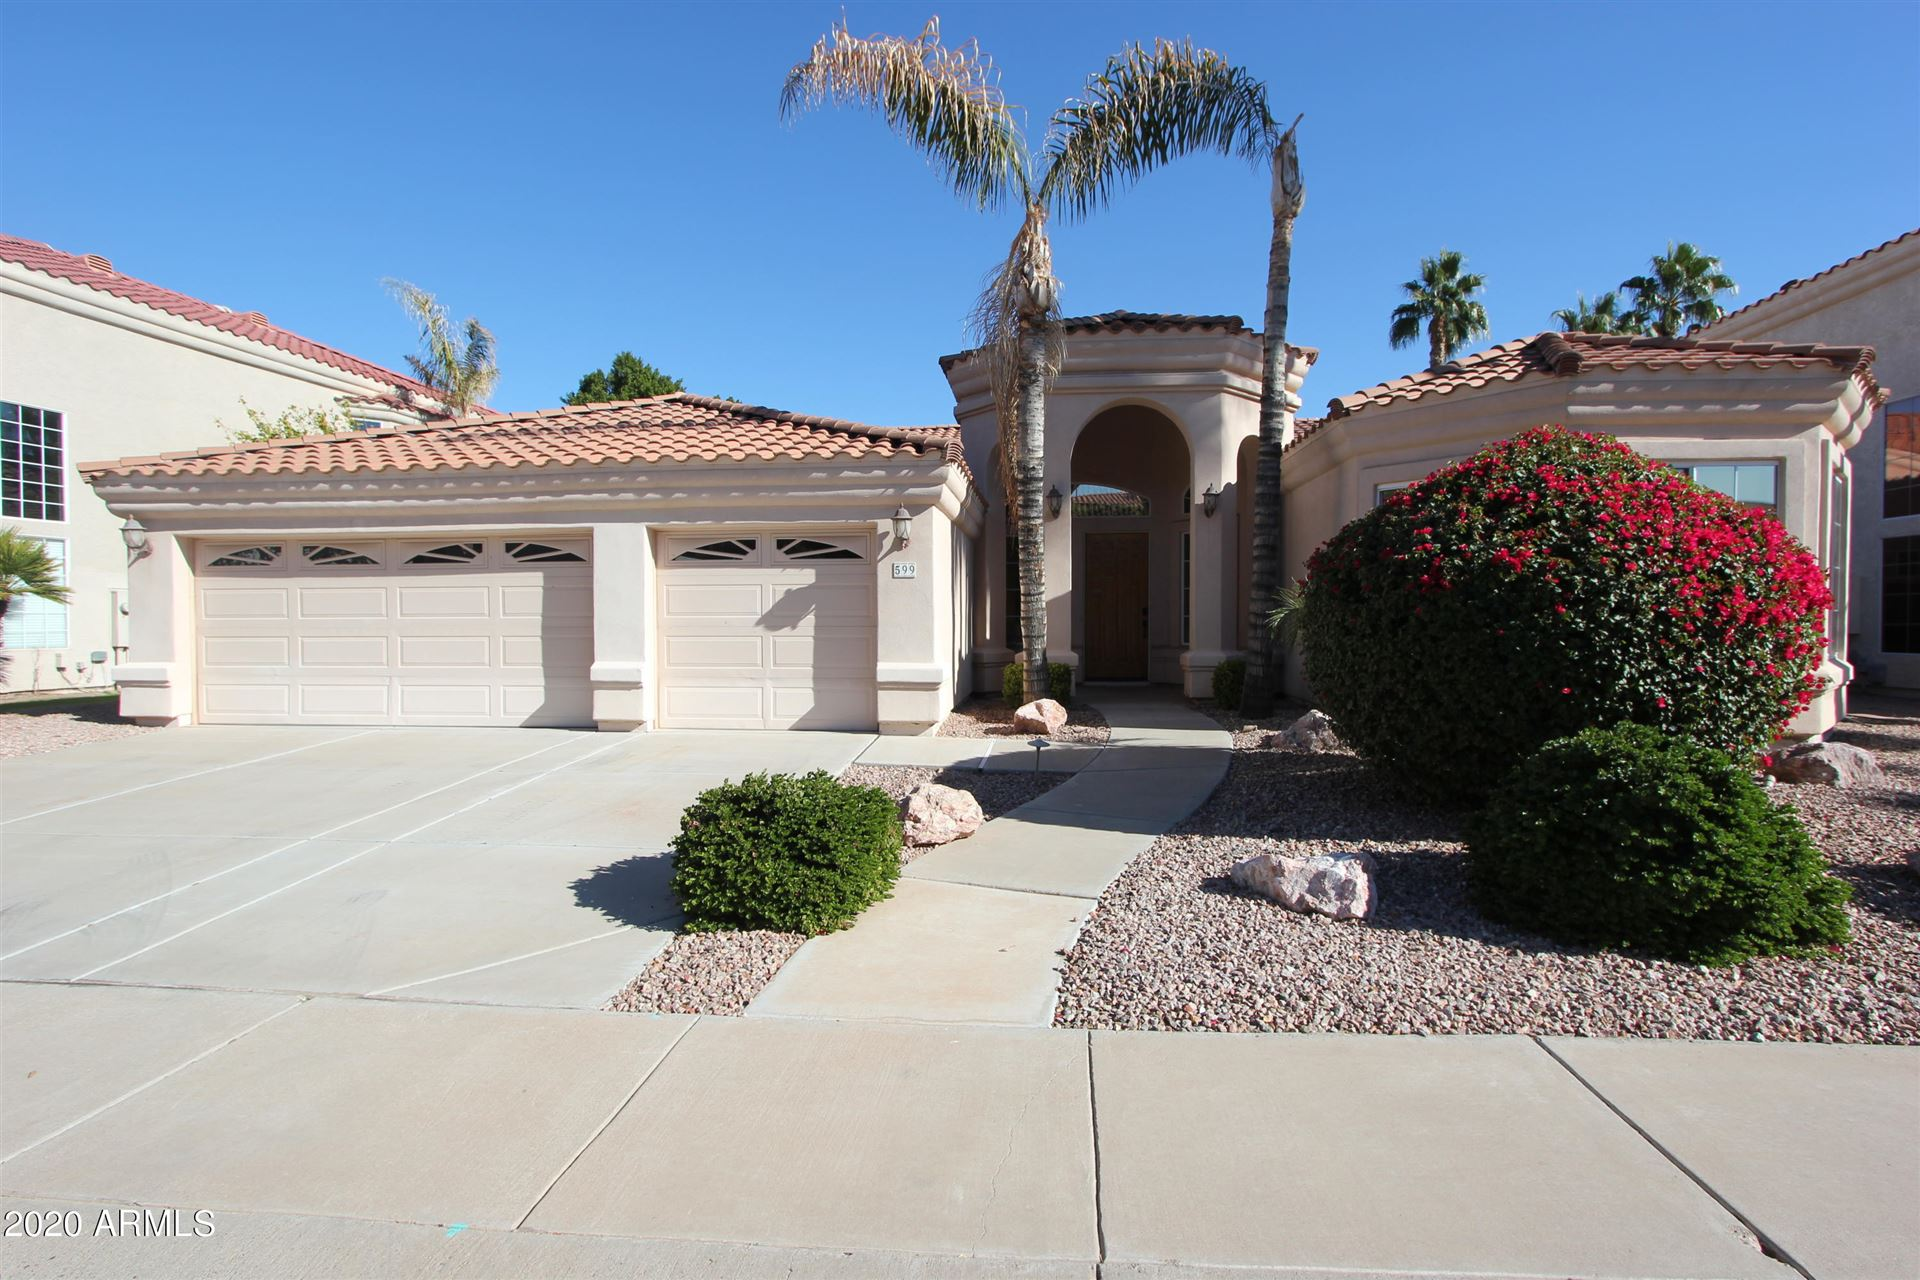 599 N ACACIA Drive, Gilbert, AZ 85233 - MLS#: 6173464